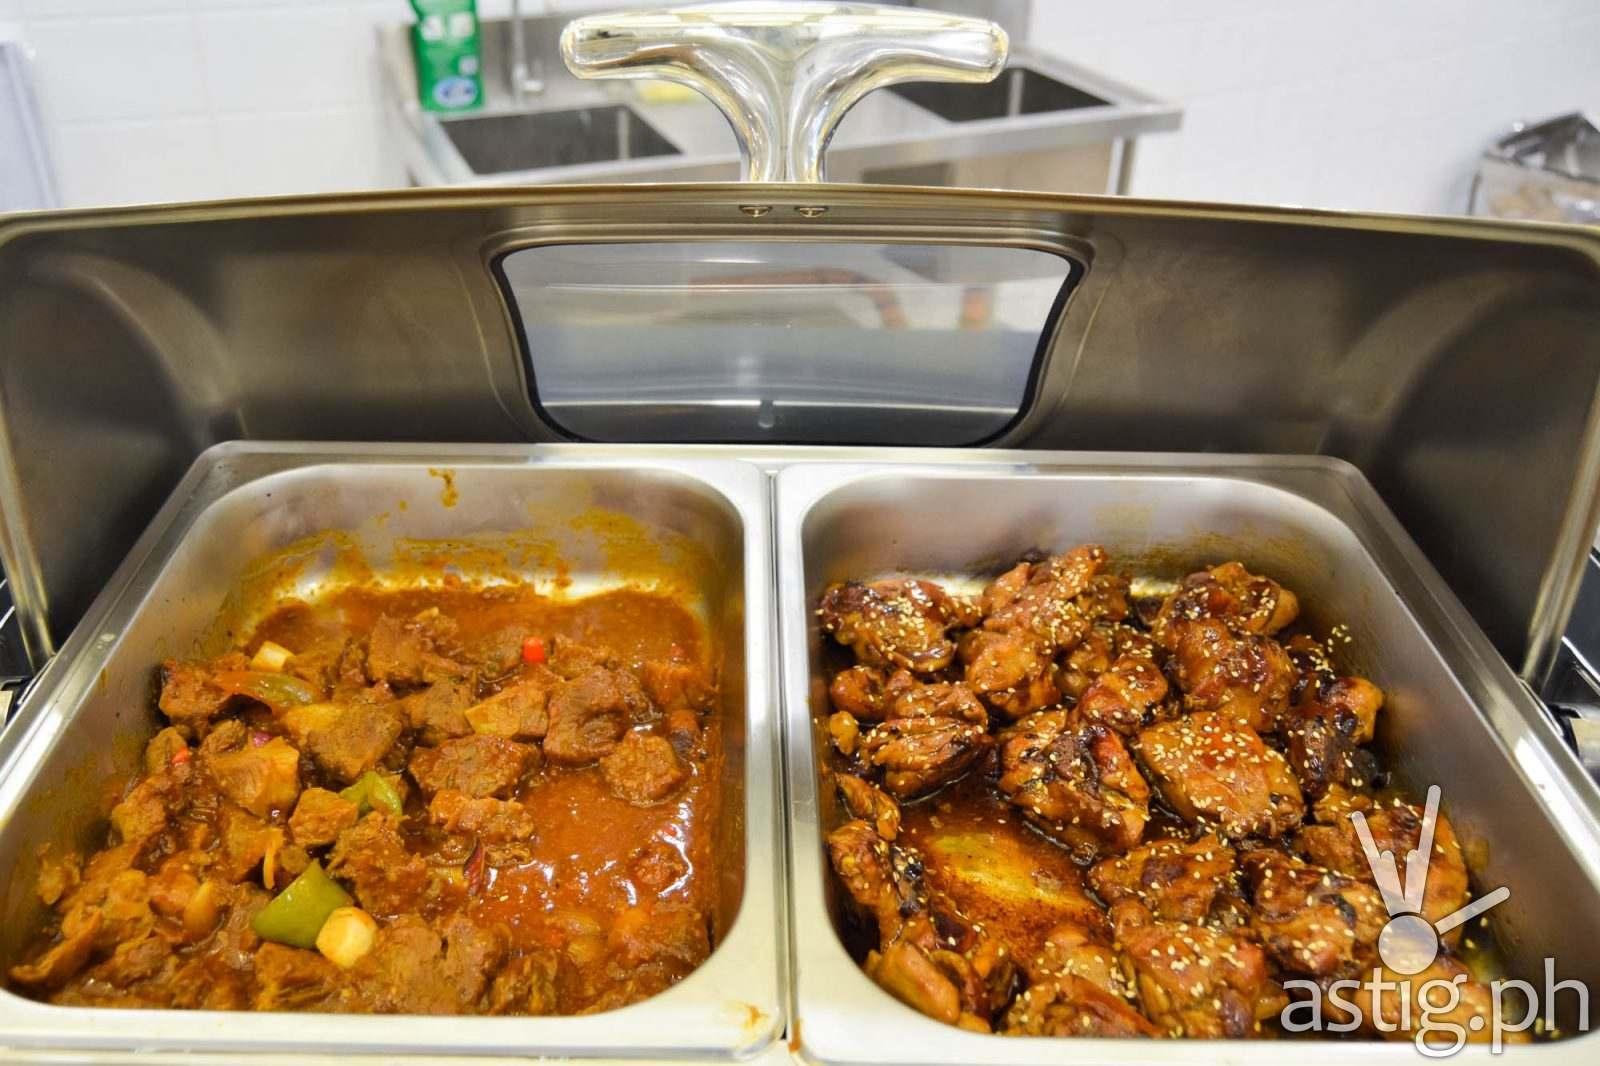 International buffet - Hosaku International Buffet Philippines SM North Tower 2